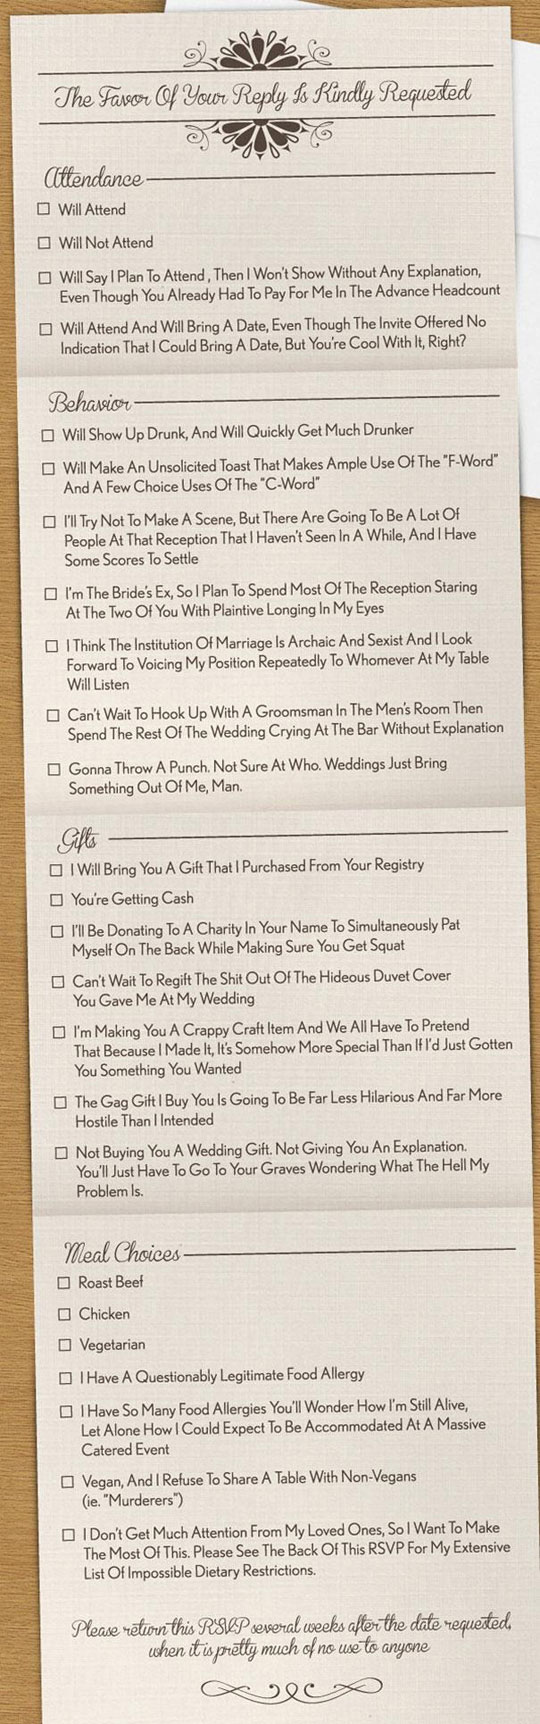 A Very Honest Wedding Invitation